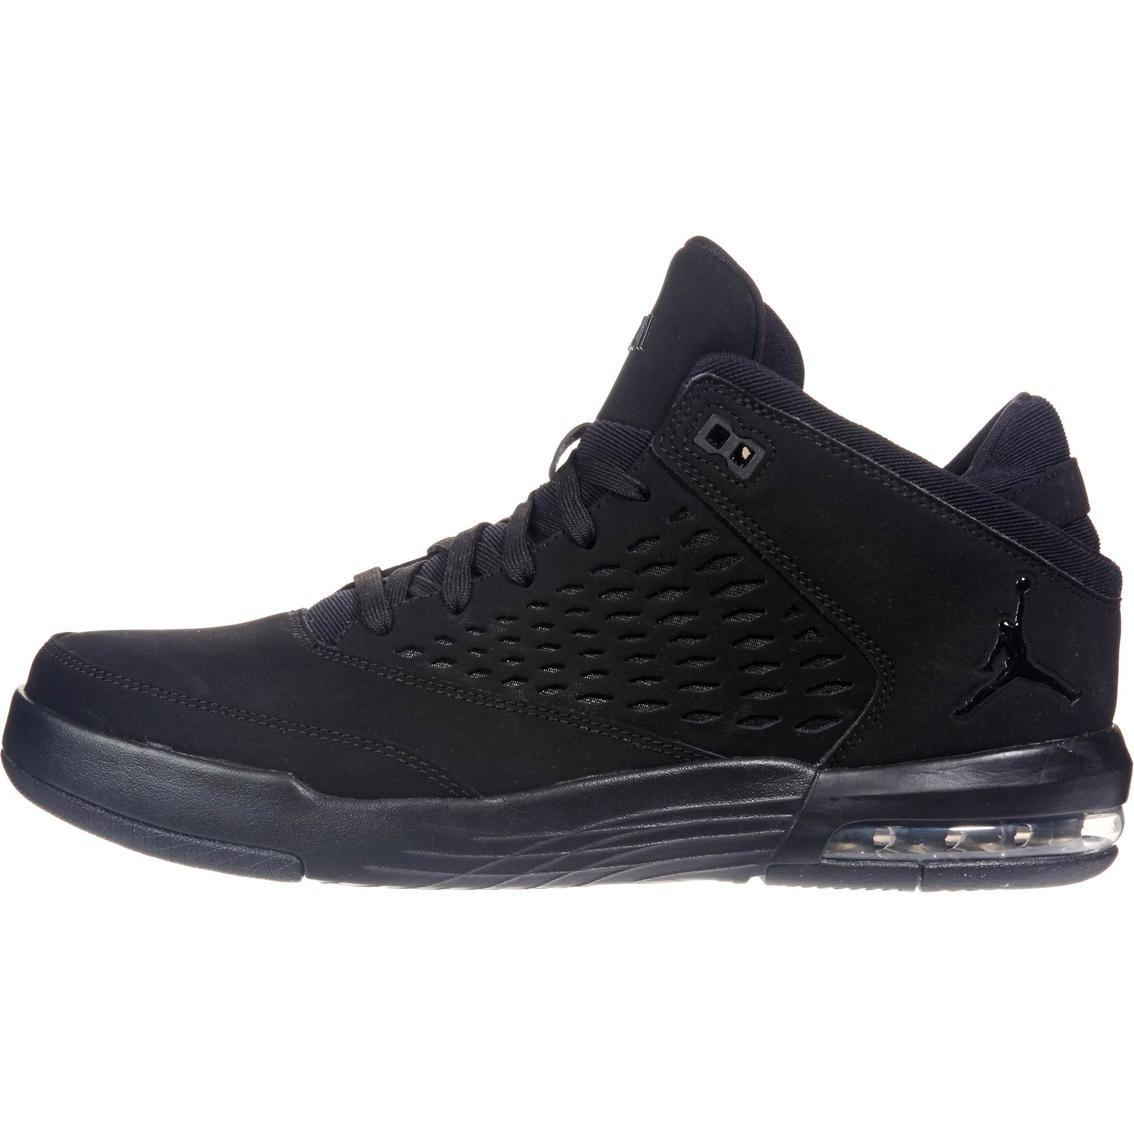 jordan shoes height enhancers medicines company 751494